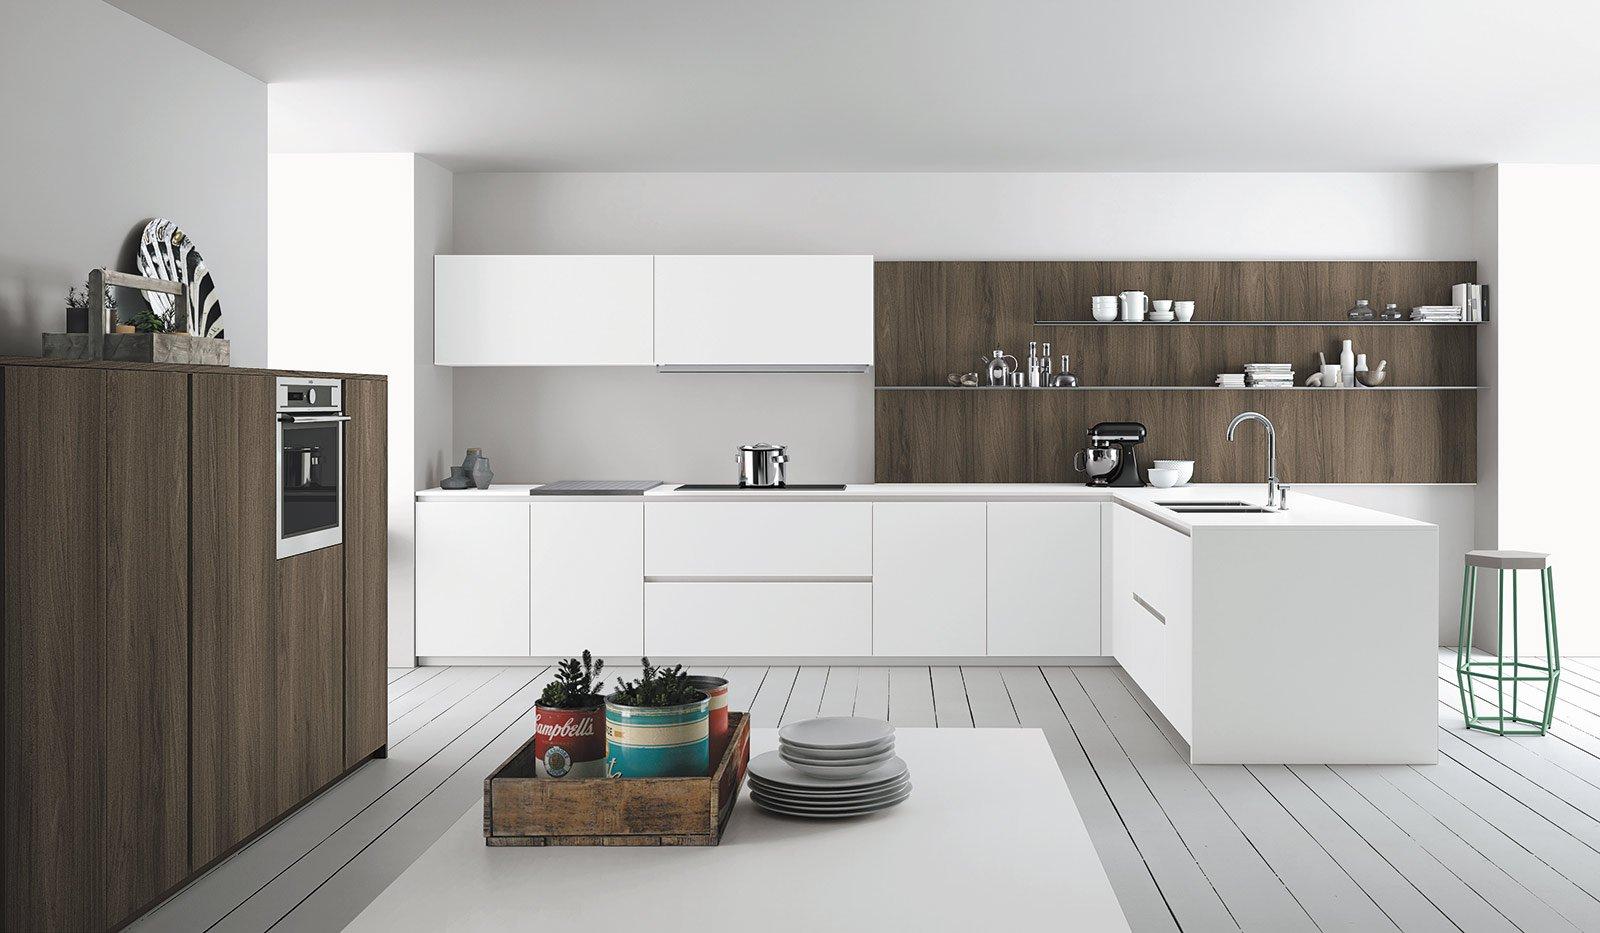 Cucine bianche moderne cose di casa for Piani di casa sotto 100k da costruire